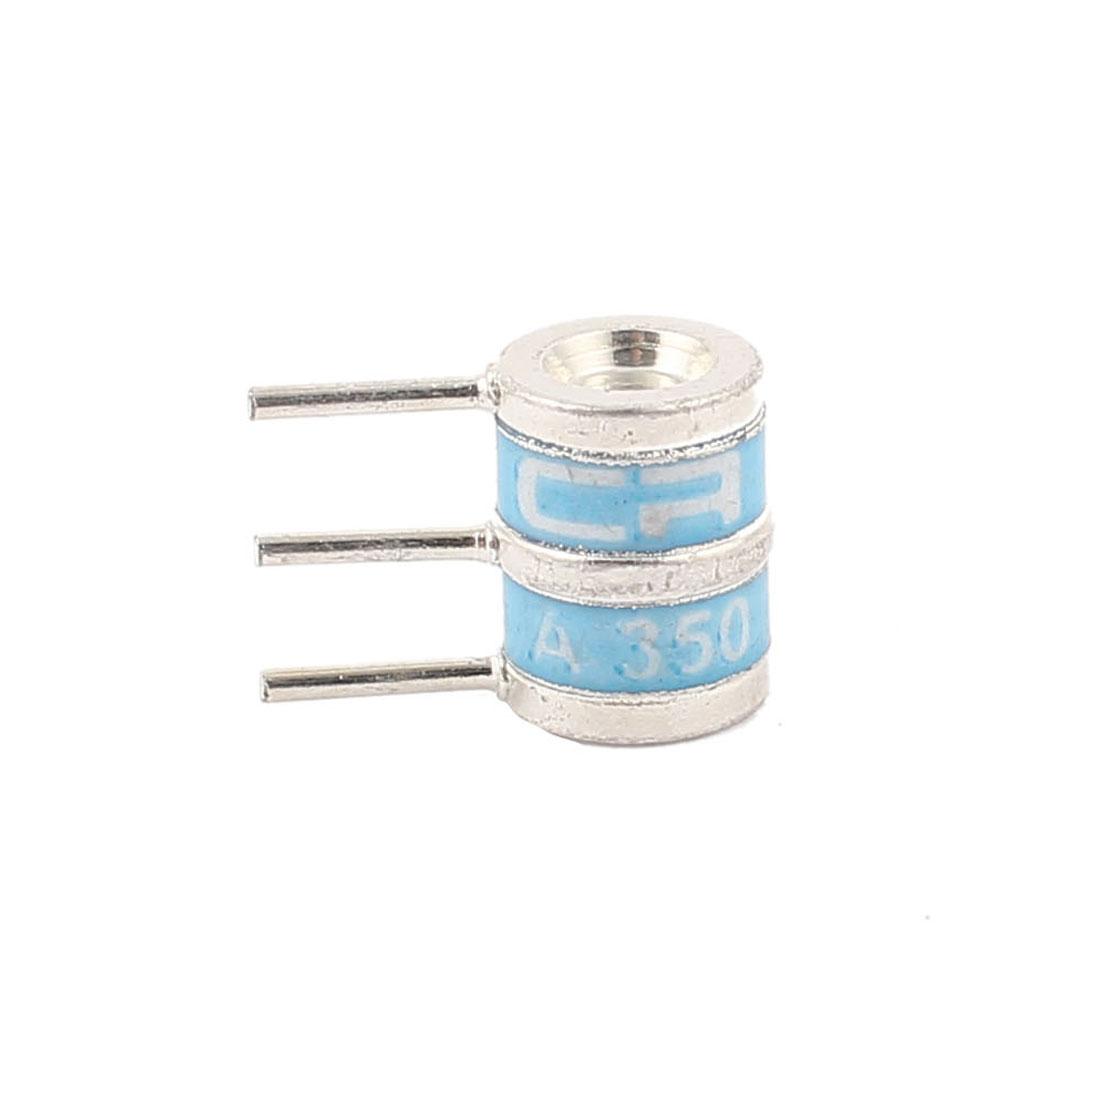 Littelfuse Gas Discharge Tube SL1021A350R 350N-036 350V Blue